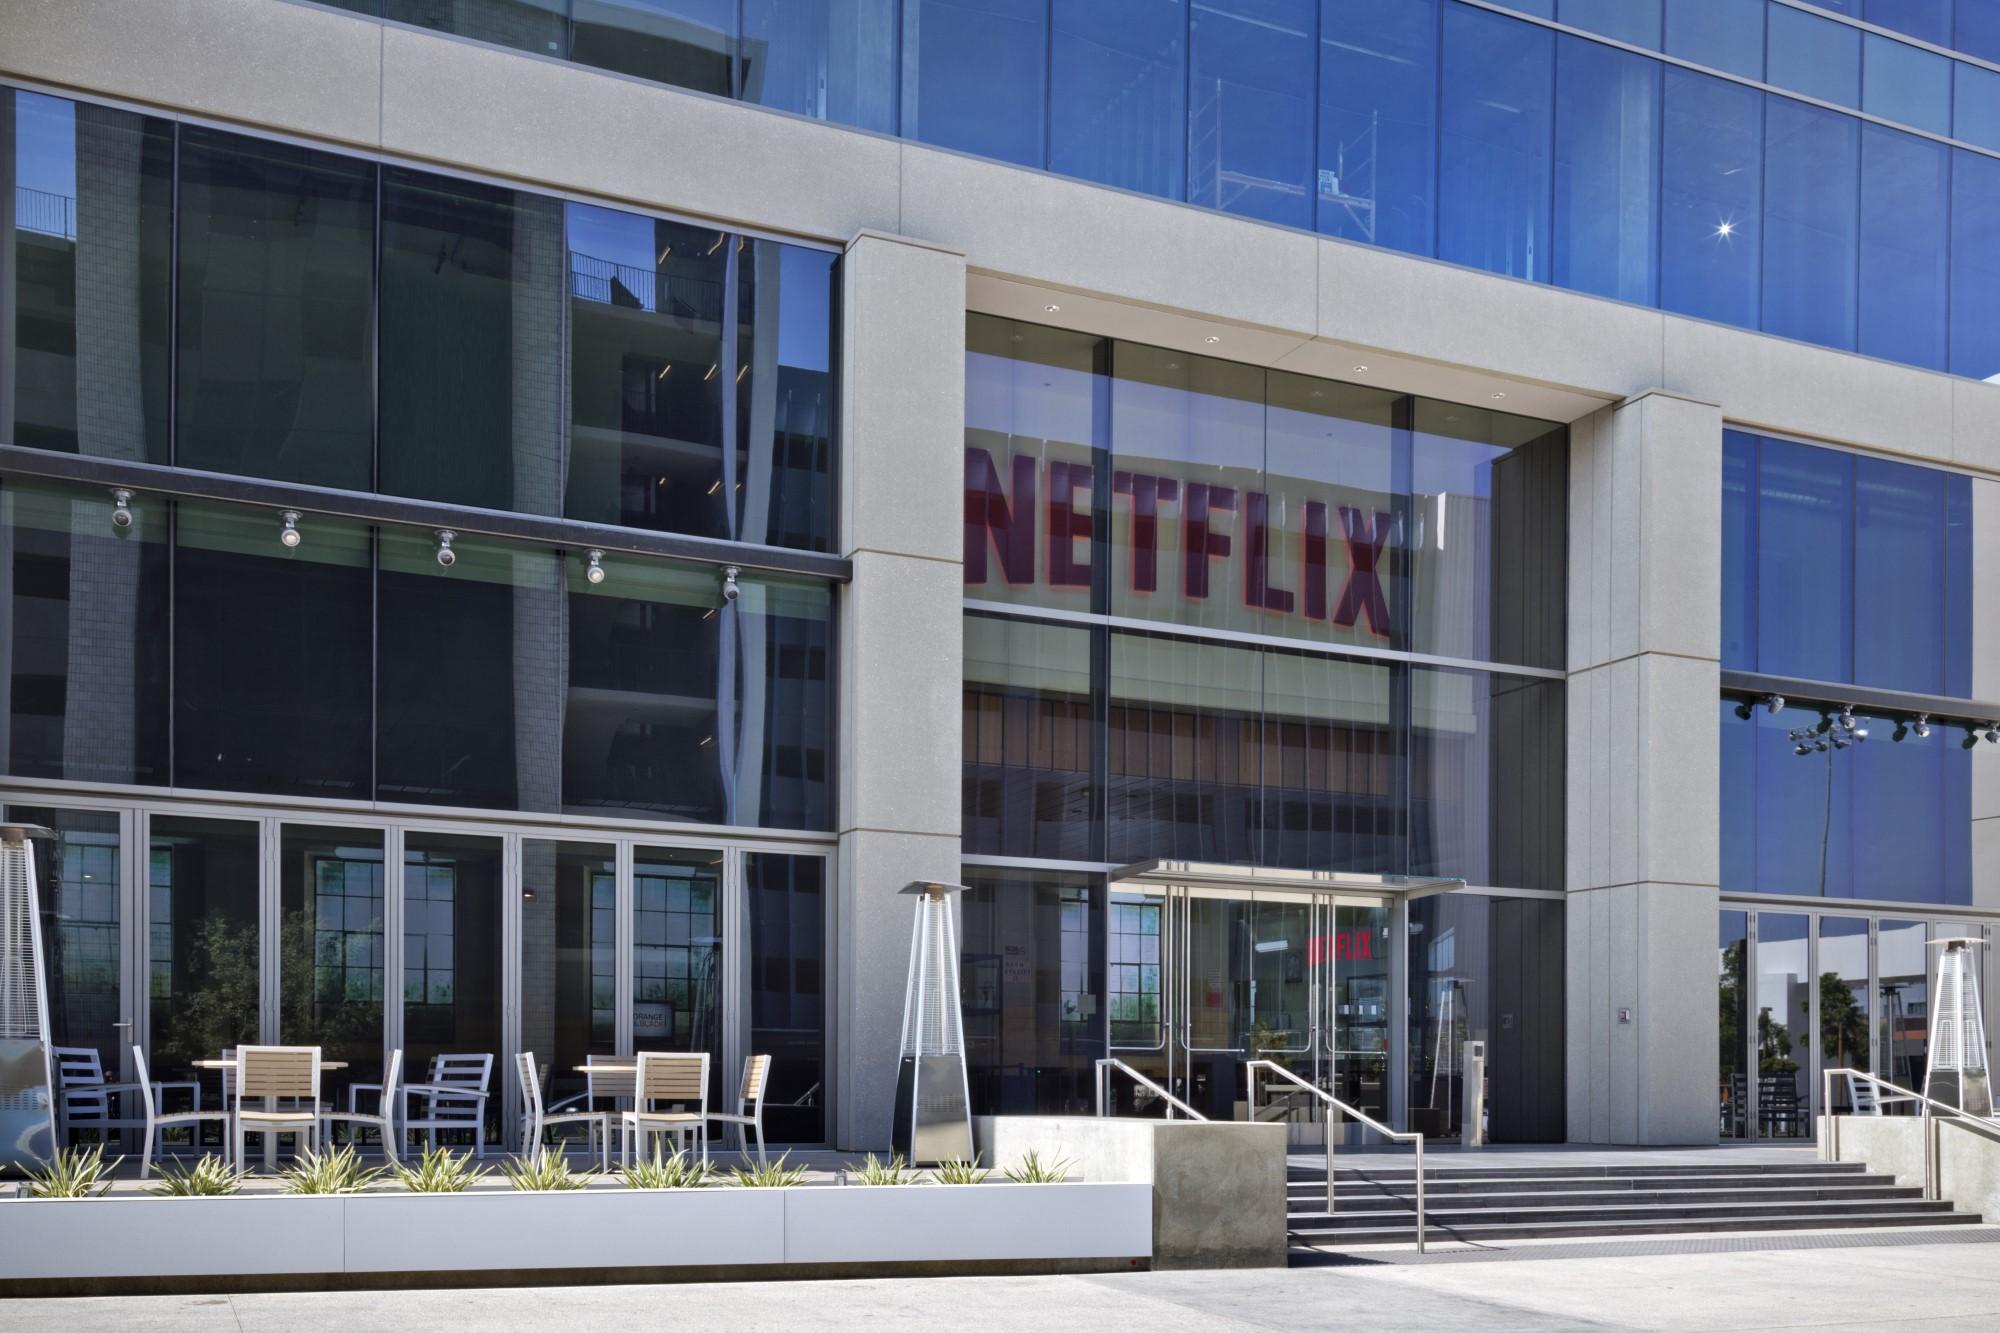 The exterior of Netflix's Los Angeles Headquarters.